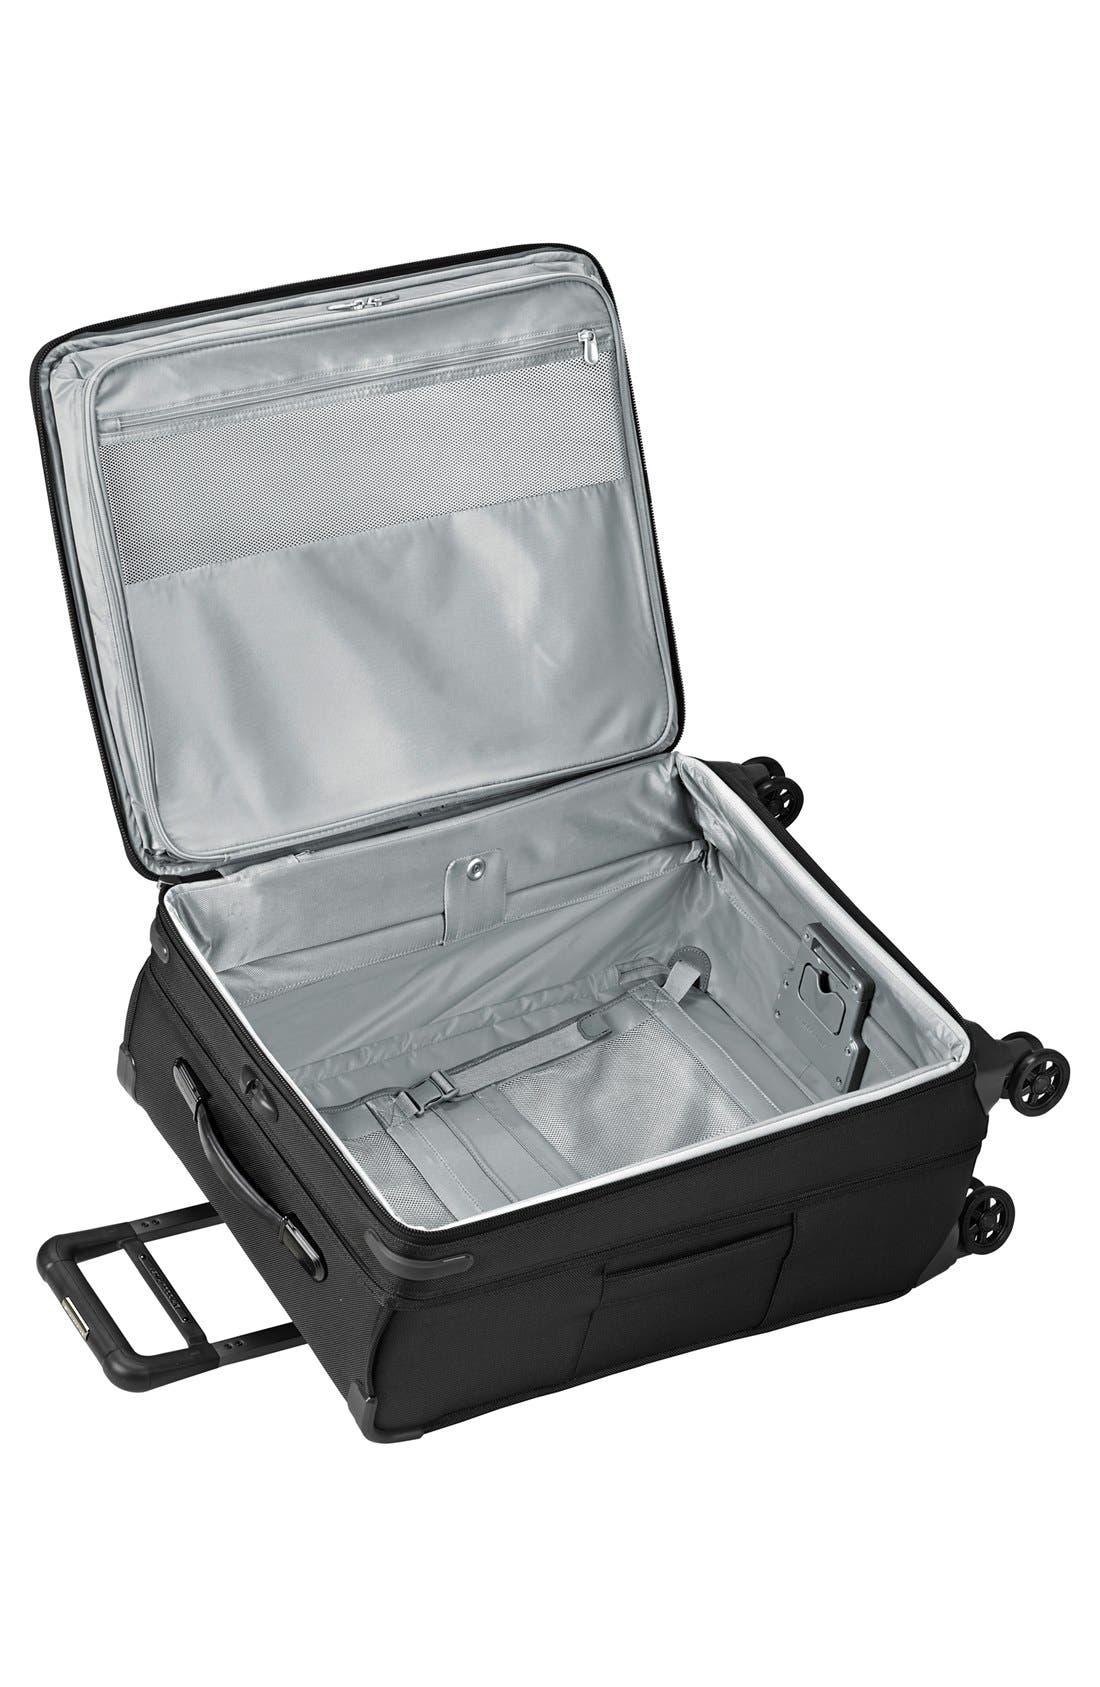 'Baseline' Medium Expandable Rolling Packing Case,                             Alternate thumbnail 2, color,                             Black